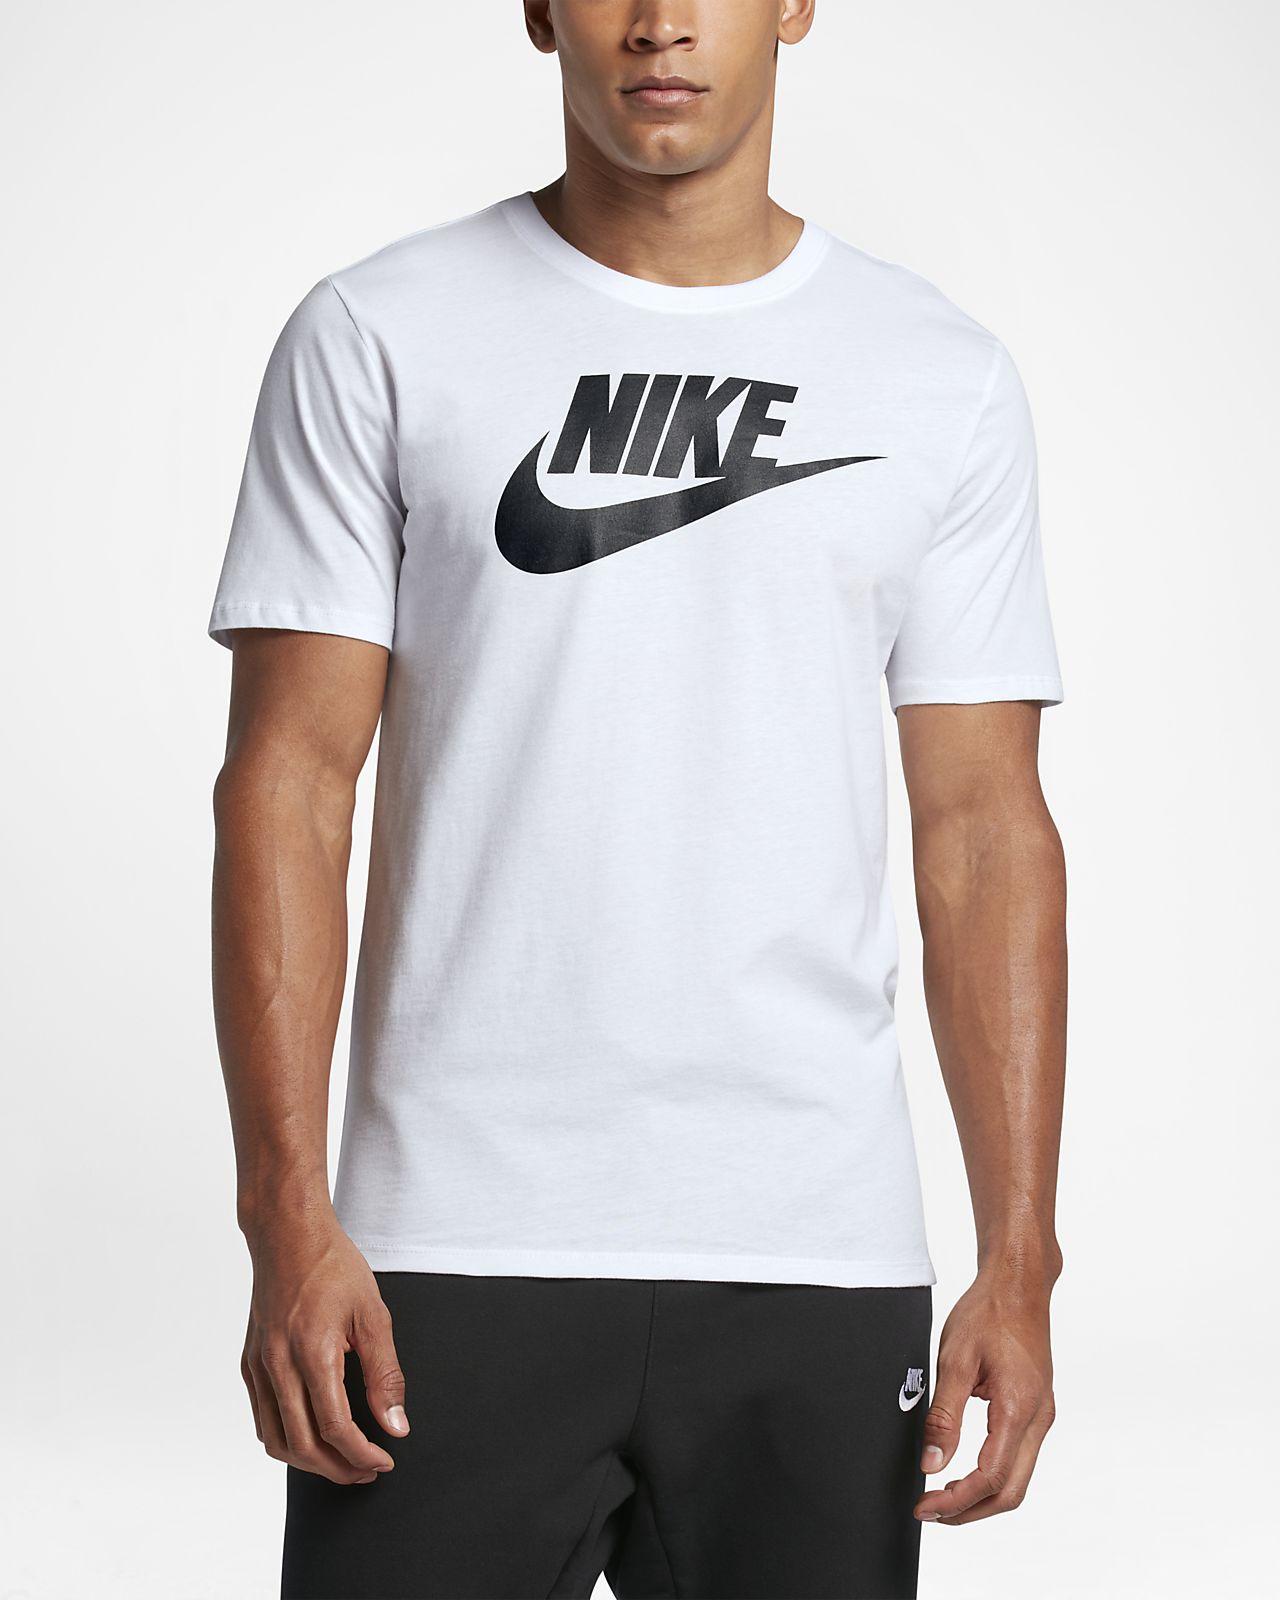 Logo Golf Shirts Nike Bcd Tofu House